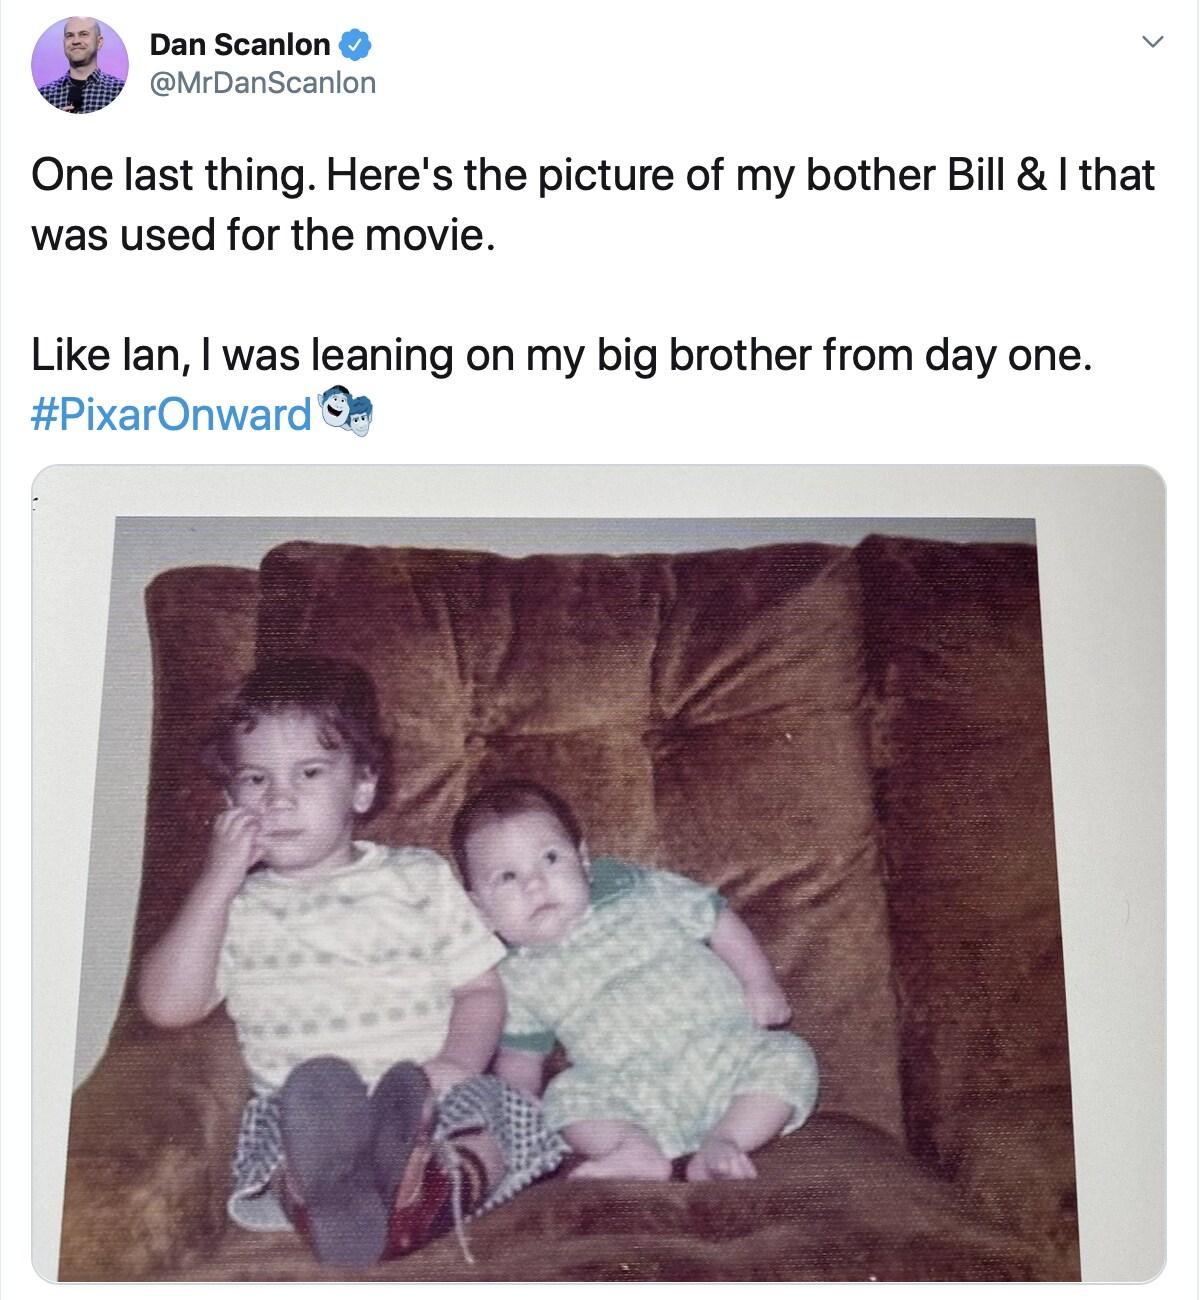 Dan Scanlon and his brother Bill